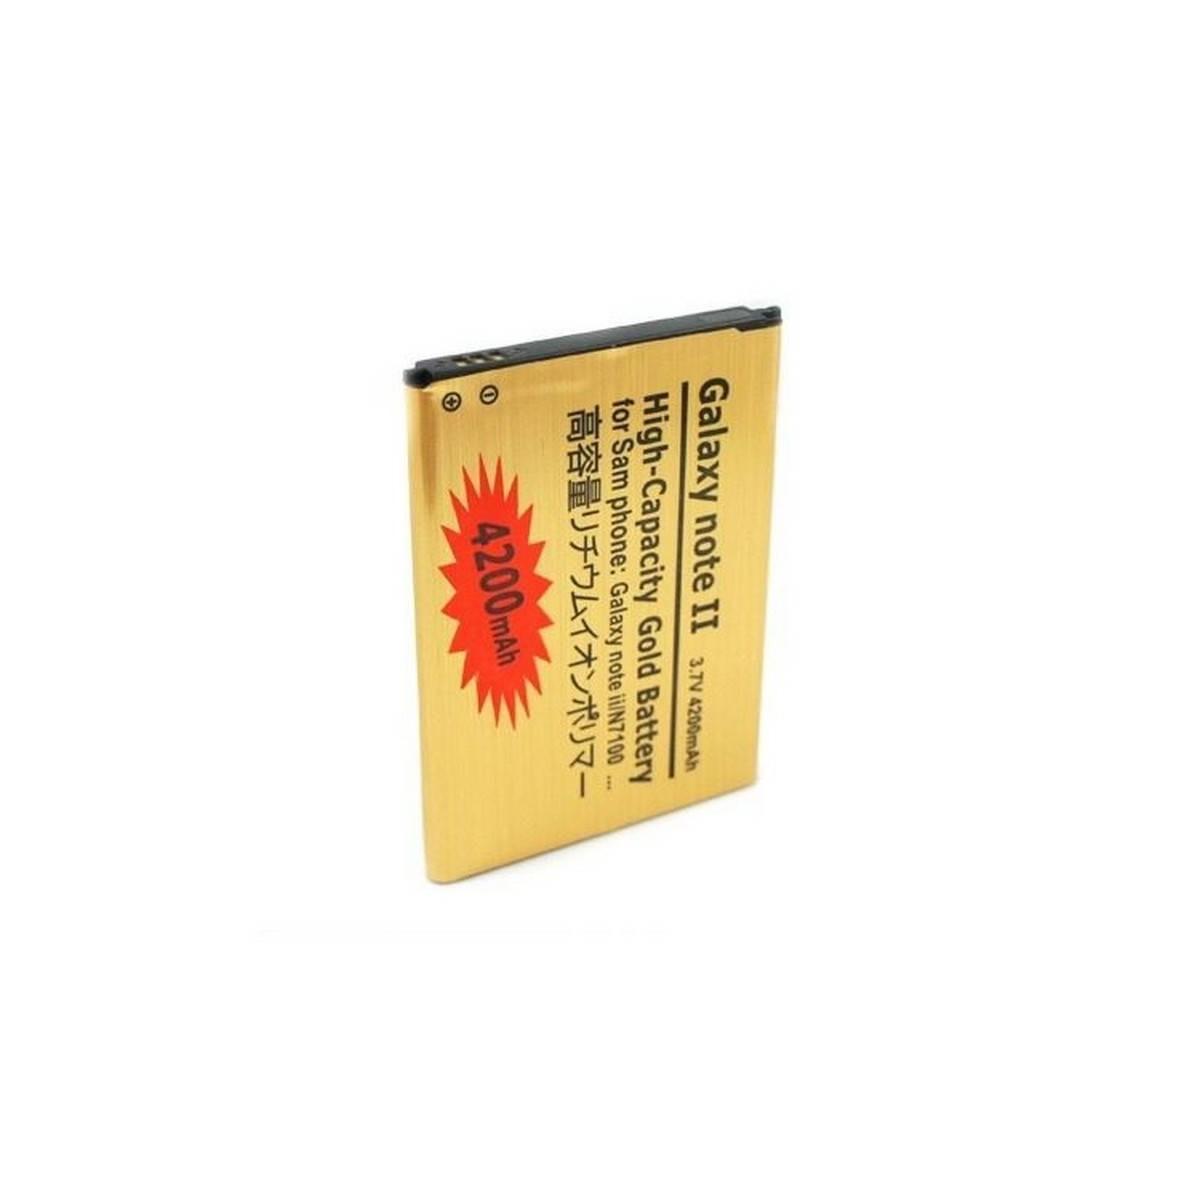 Bateria compativel 4200mAh alta capacidad galaxy Note 2 / N7100